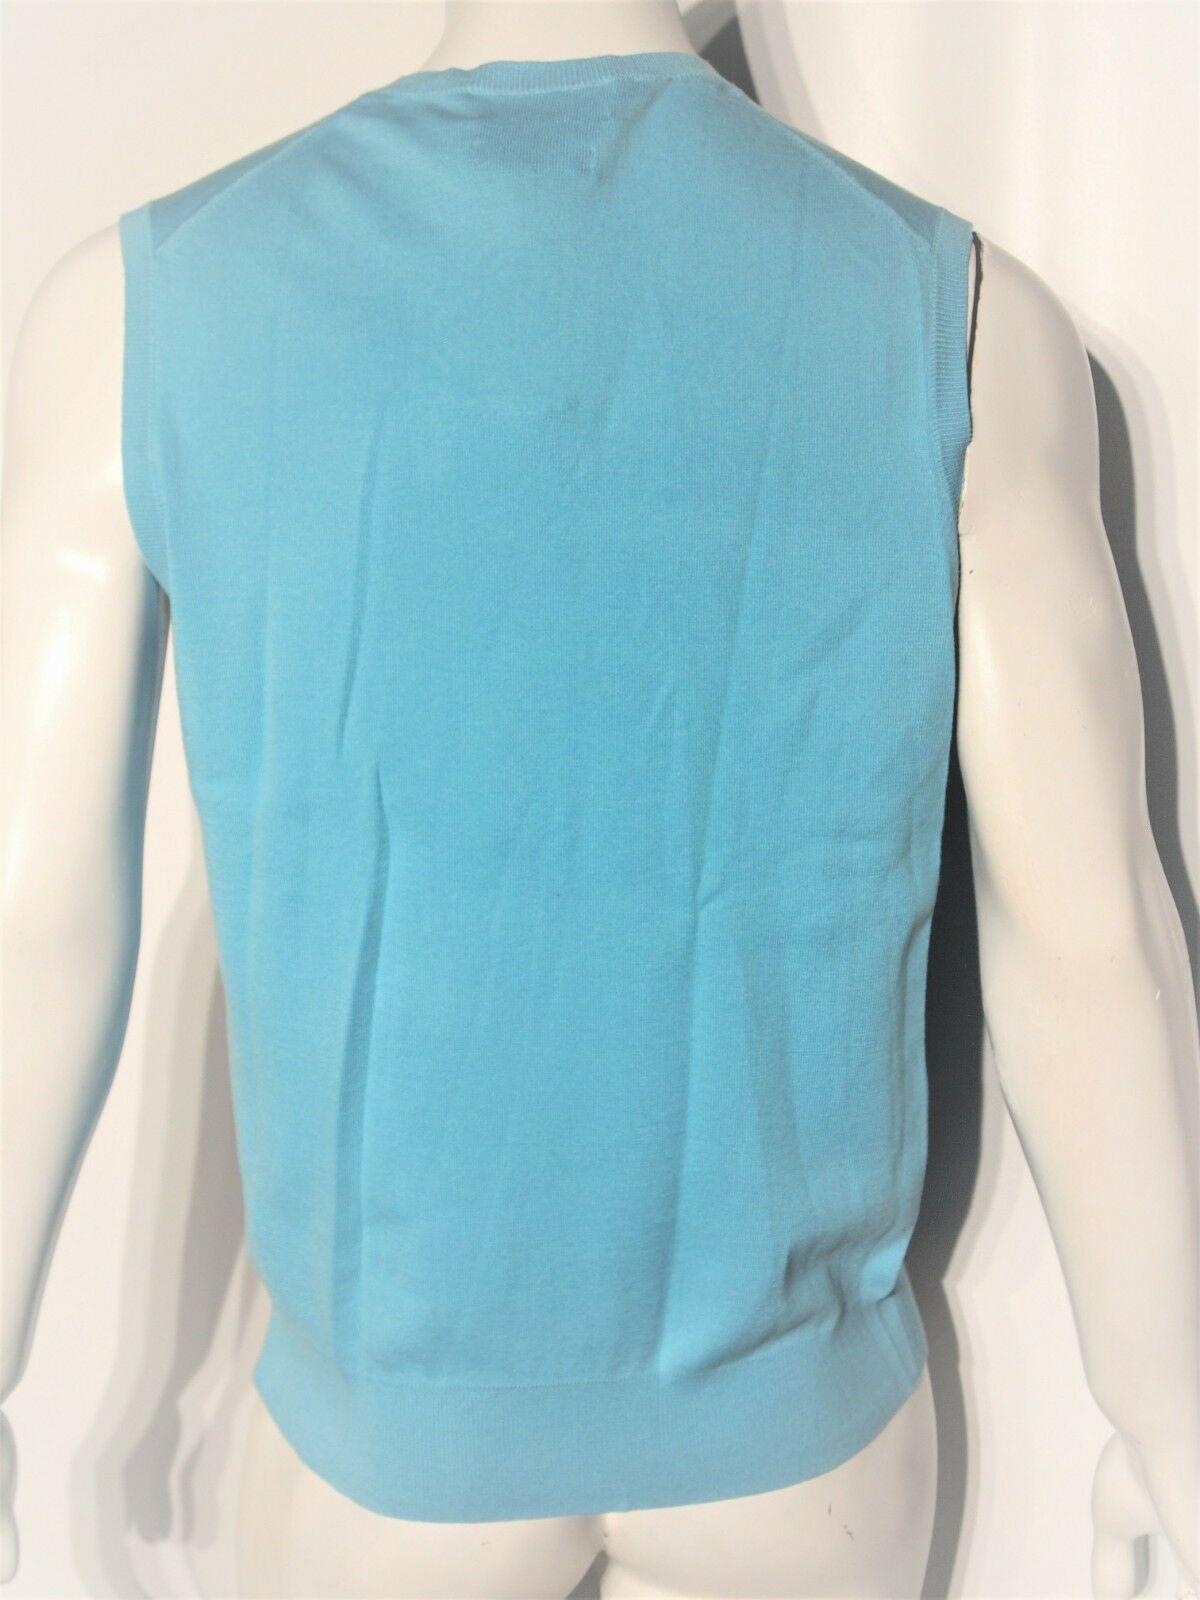 Polo Ralph Lauren mens pullover sweater vest size large image 3